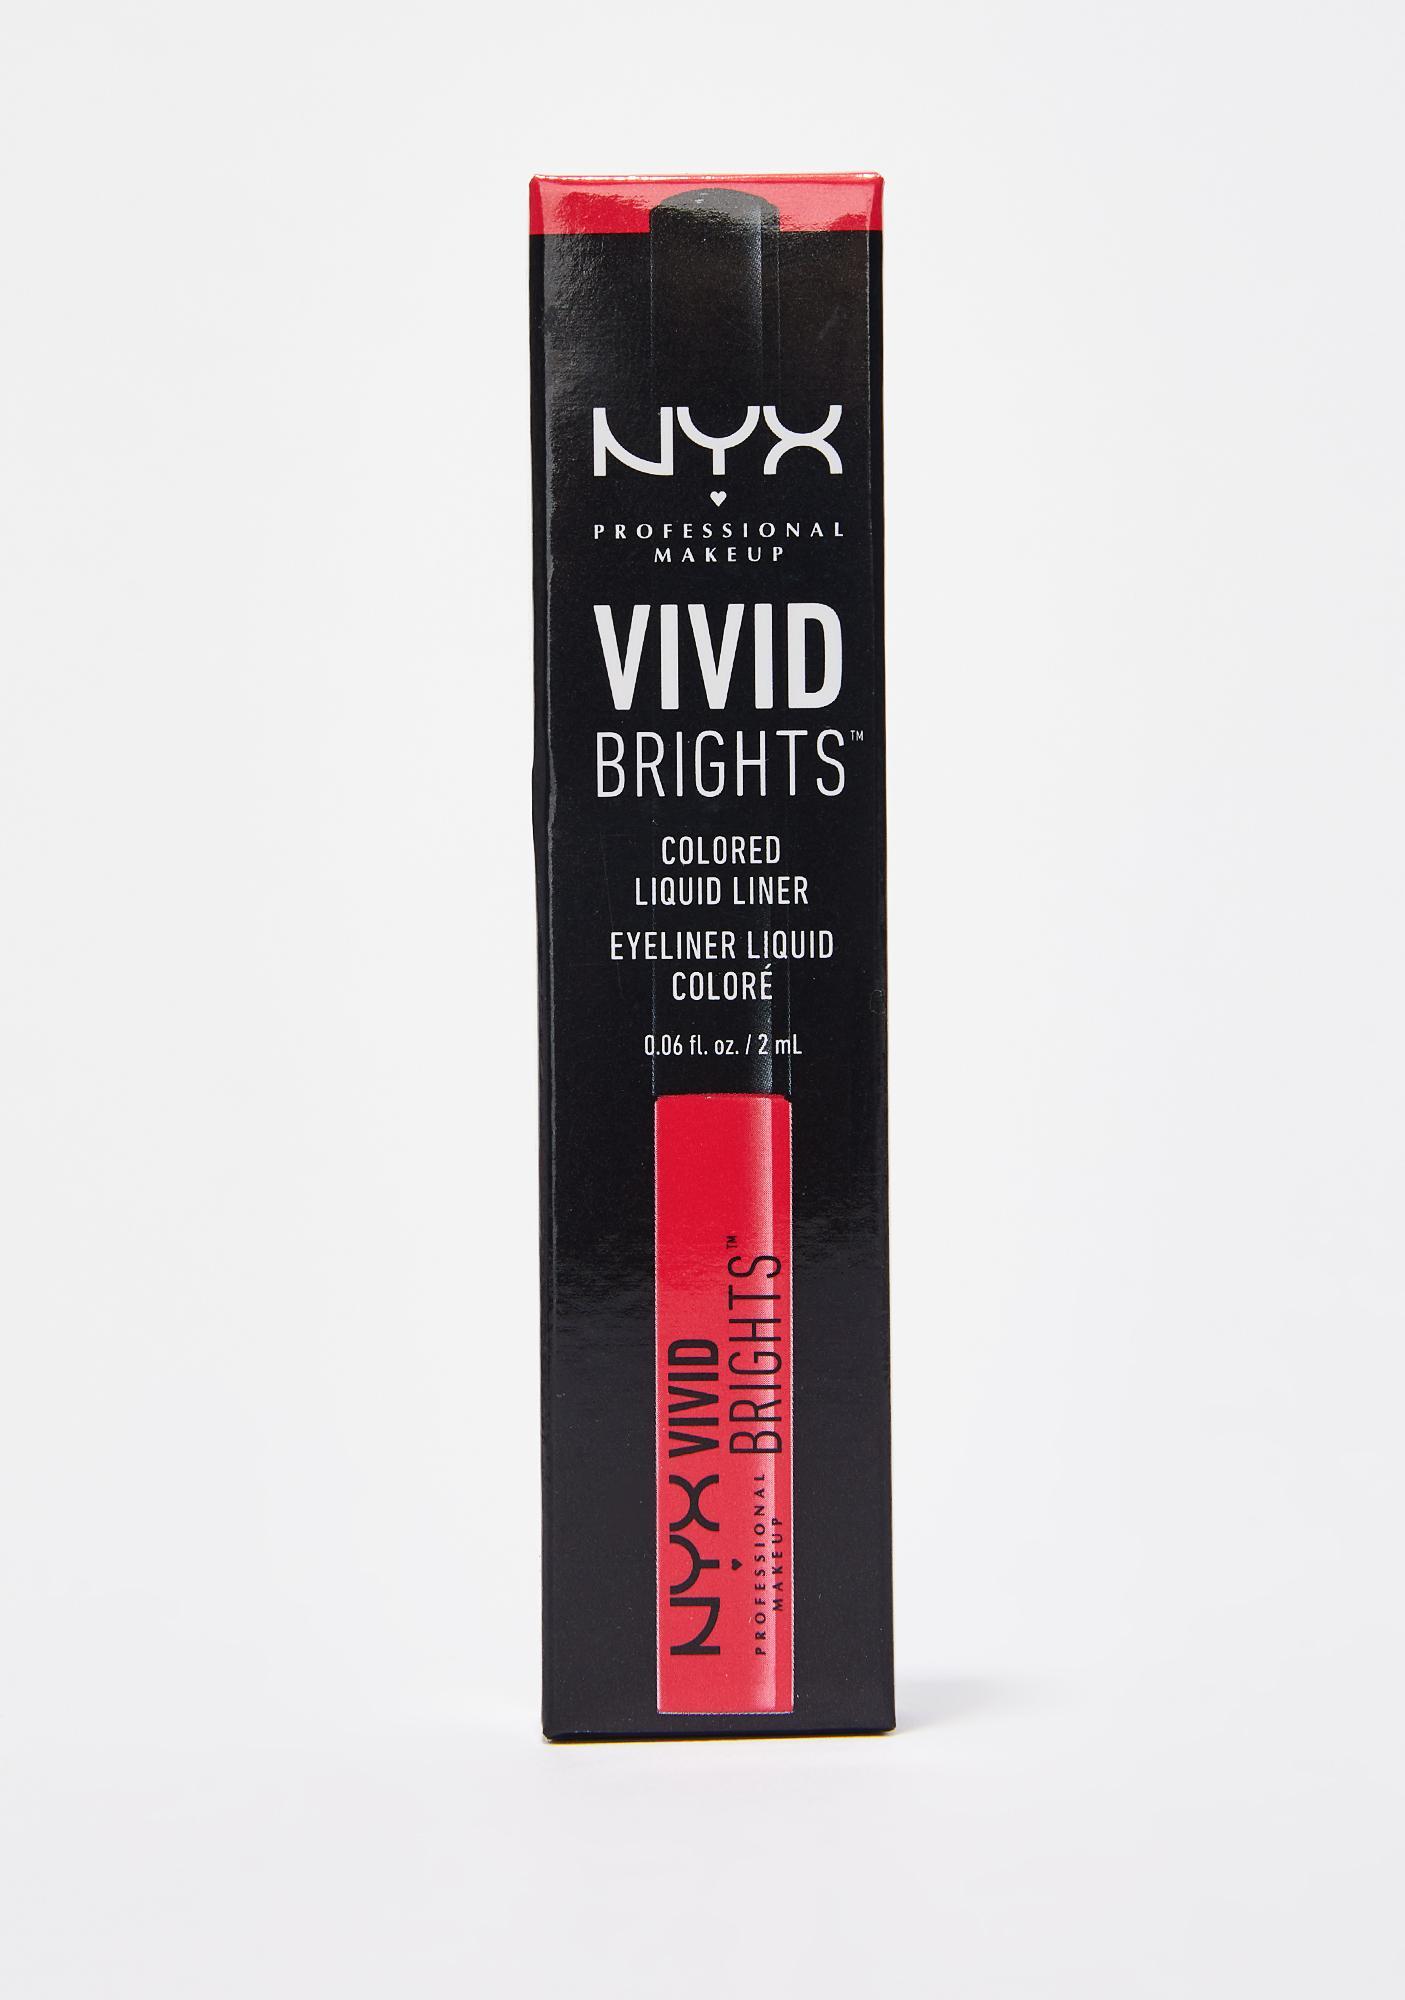 NYX Vivid Fire Vivid Brights Eyeliner